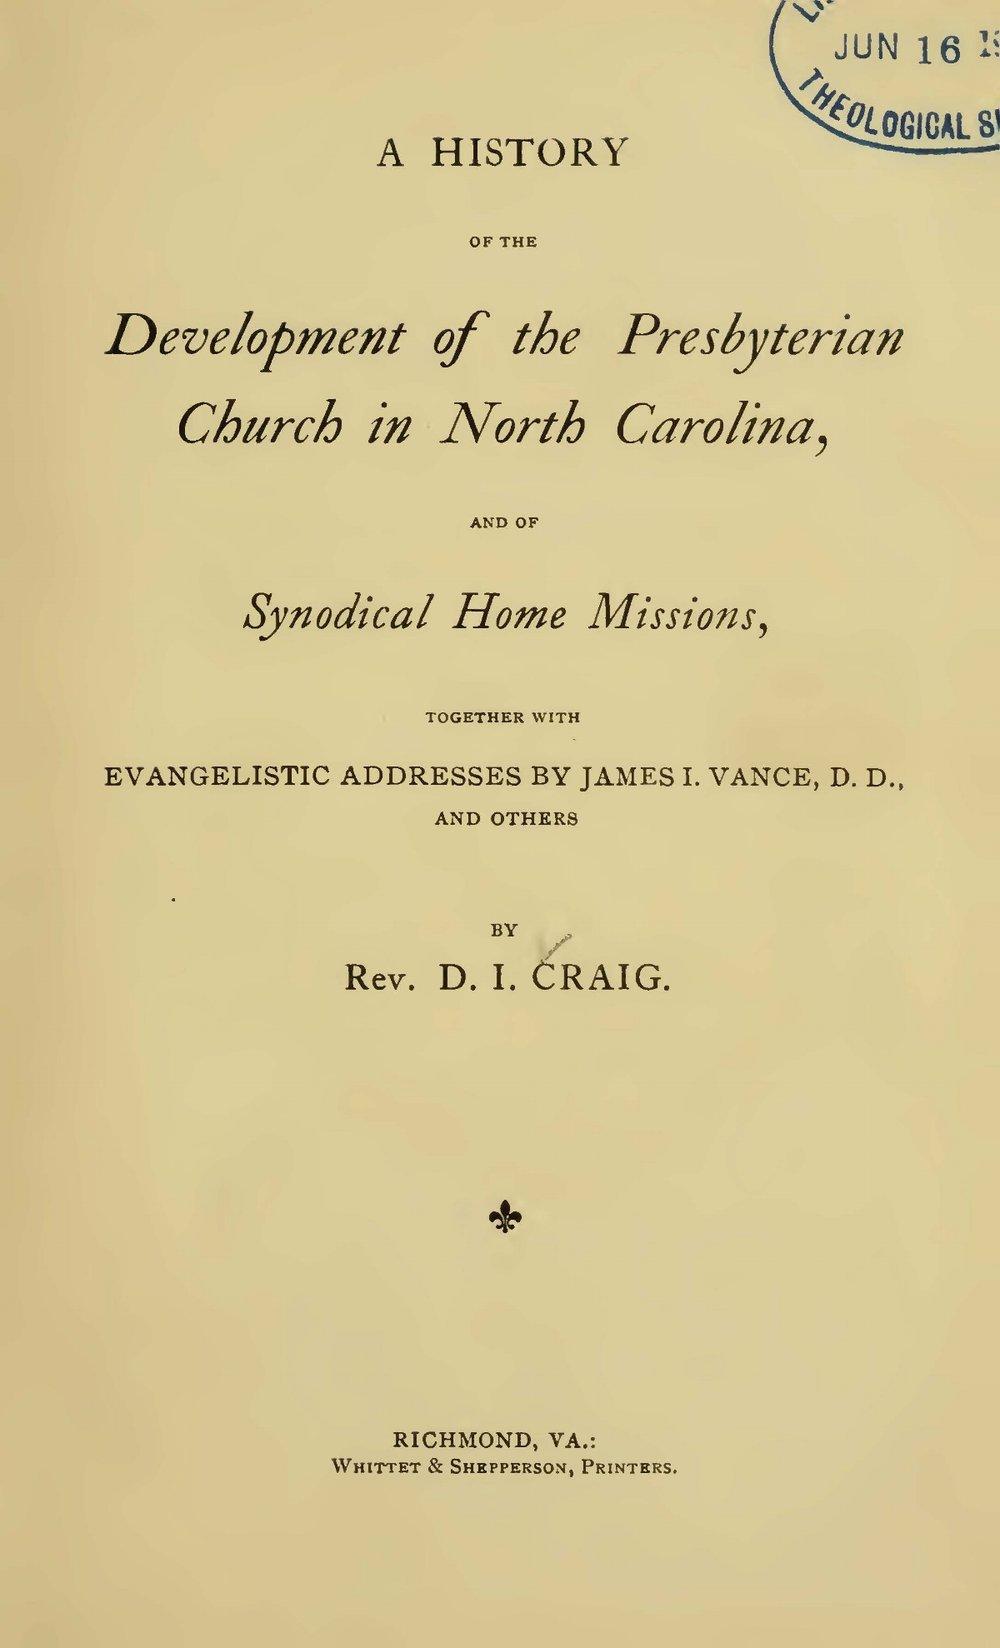 Craig, David Irwin, A History of the Development of the Presbyterian Church in North Carolina Title Page.jpg